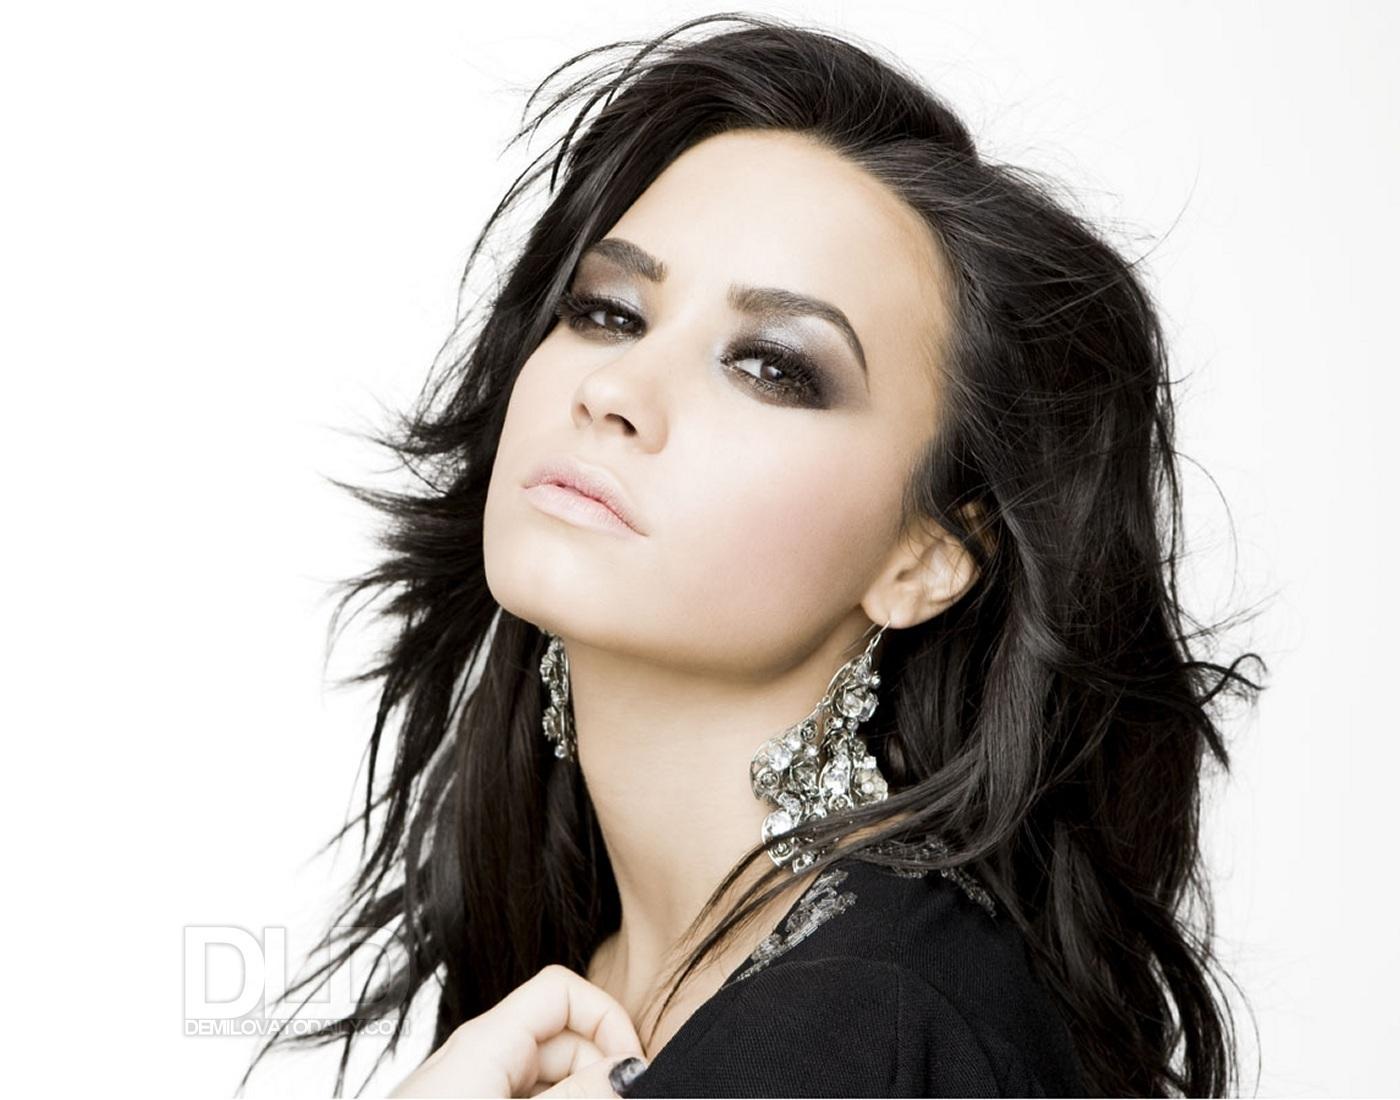 Demi Lovato - Fotos - VAGALUME - VAGALUME - Letras de